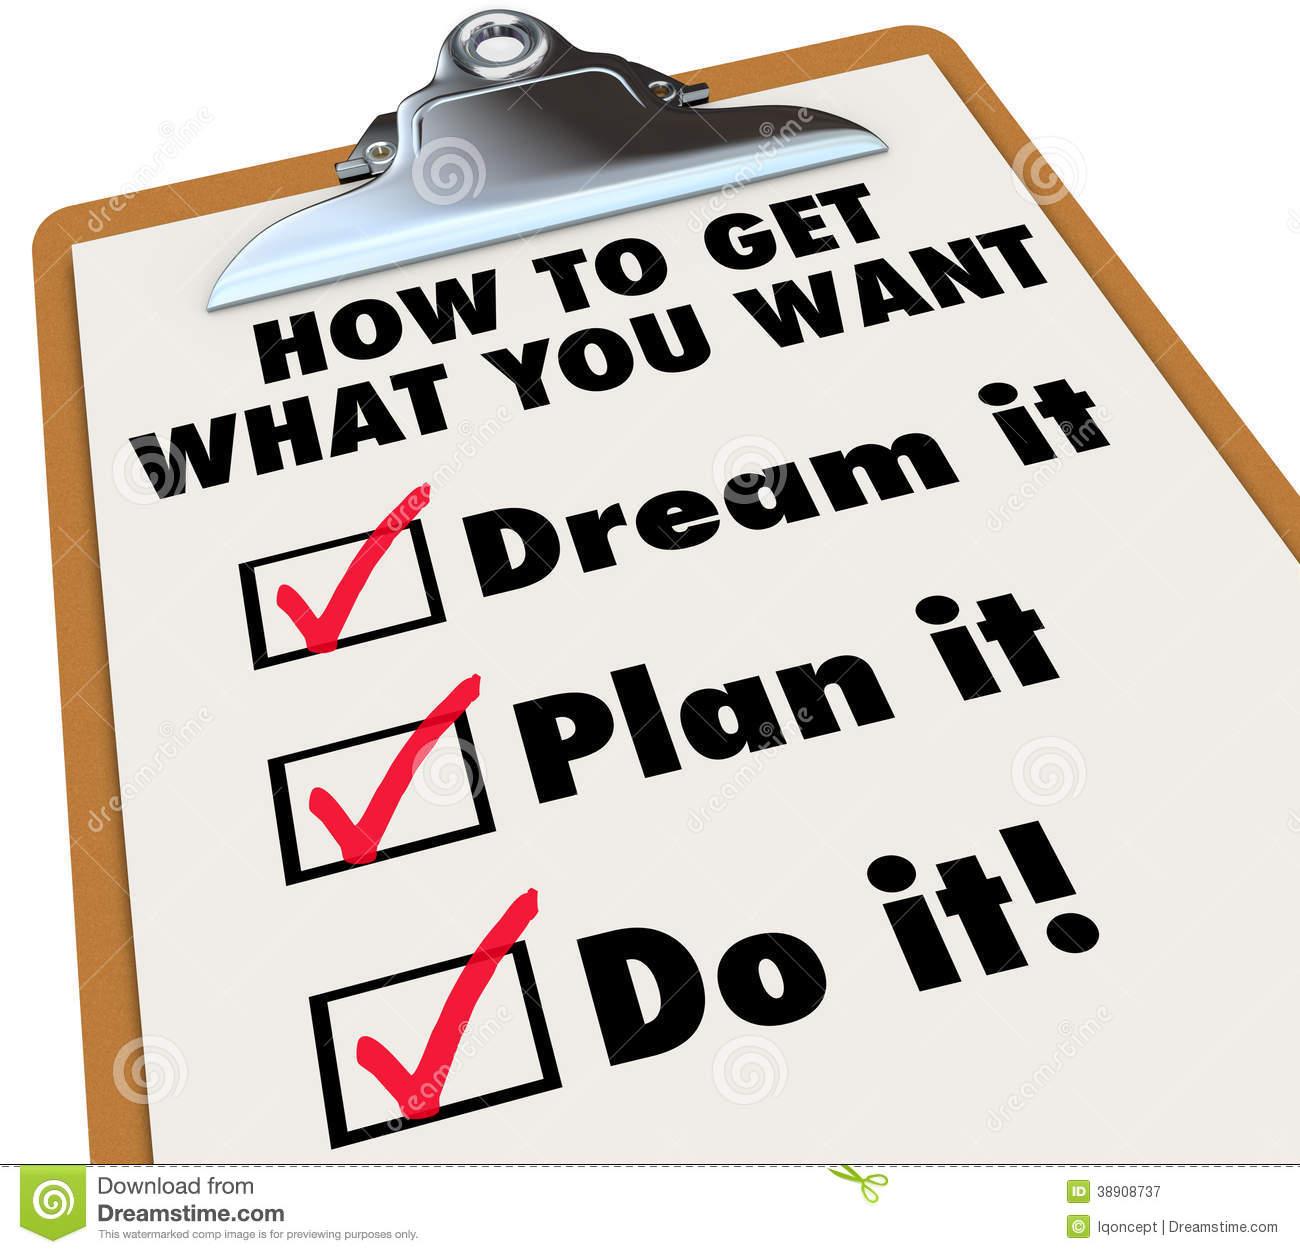 desire or goal dream clipart panda free clipart images rh clipartpanda com how to do clipart on microsoft word how to do clipart on word